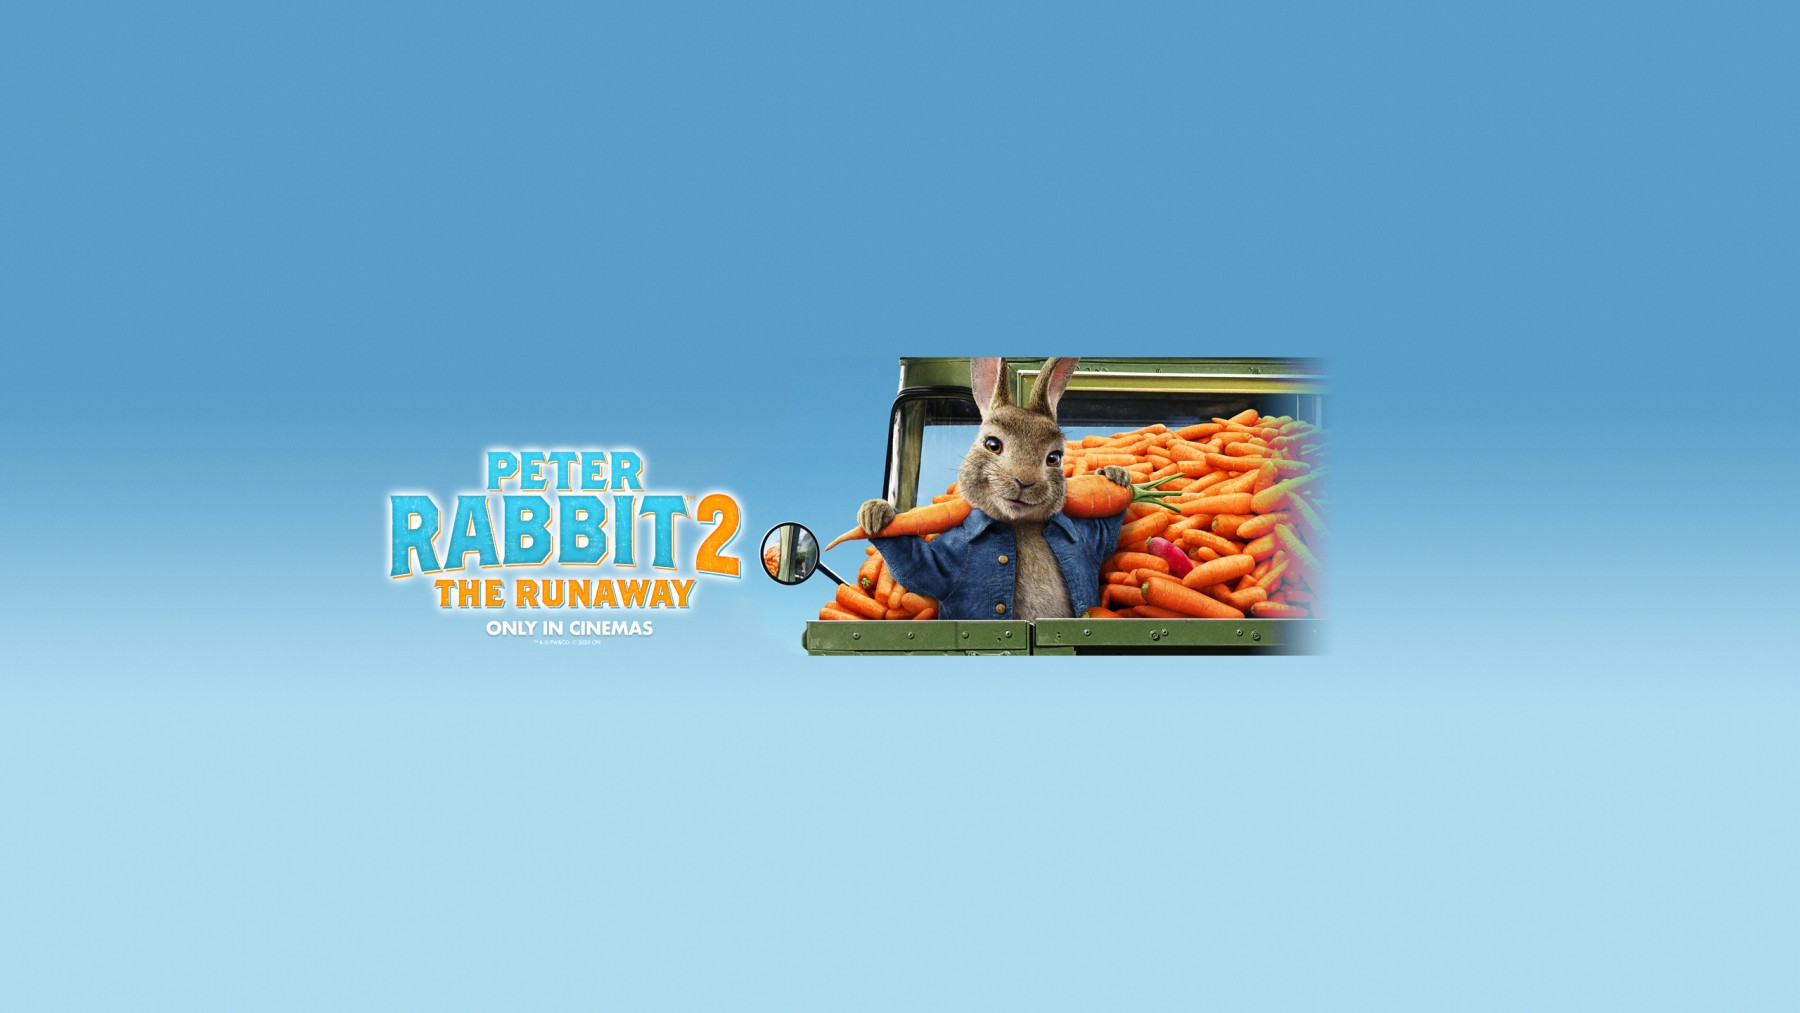 peter-rabbit-2-the-runaway-family-escapade